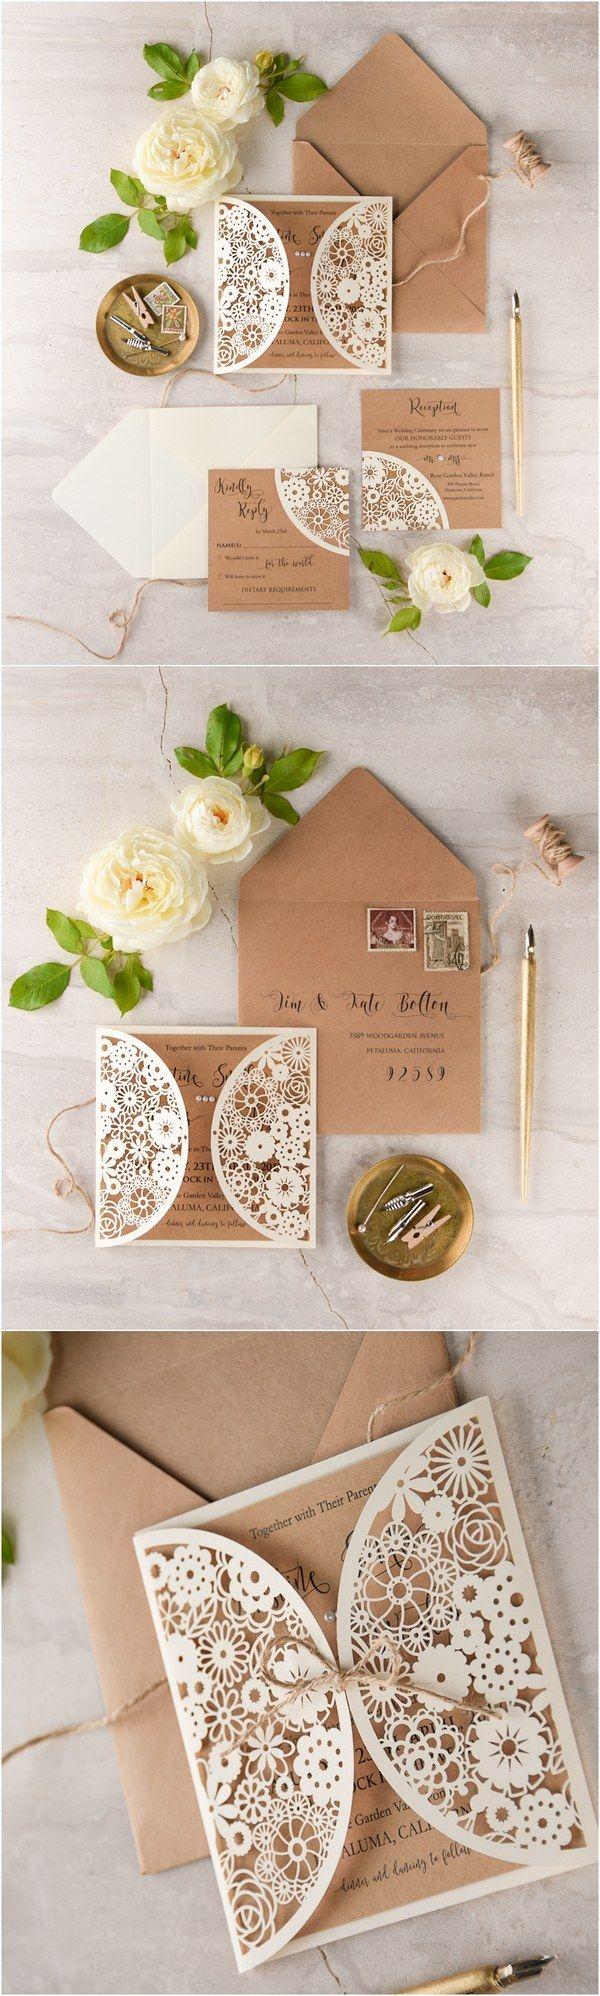 best wedding card manufacturers in delhi%0A We Love  Laser Cut Wedding Invitations   lovepolkadots